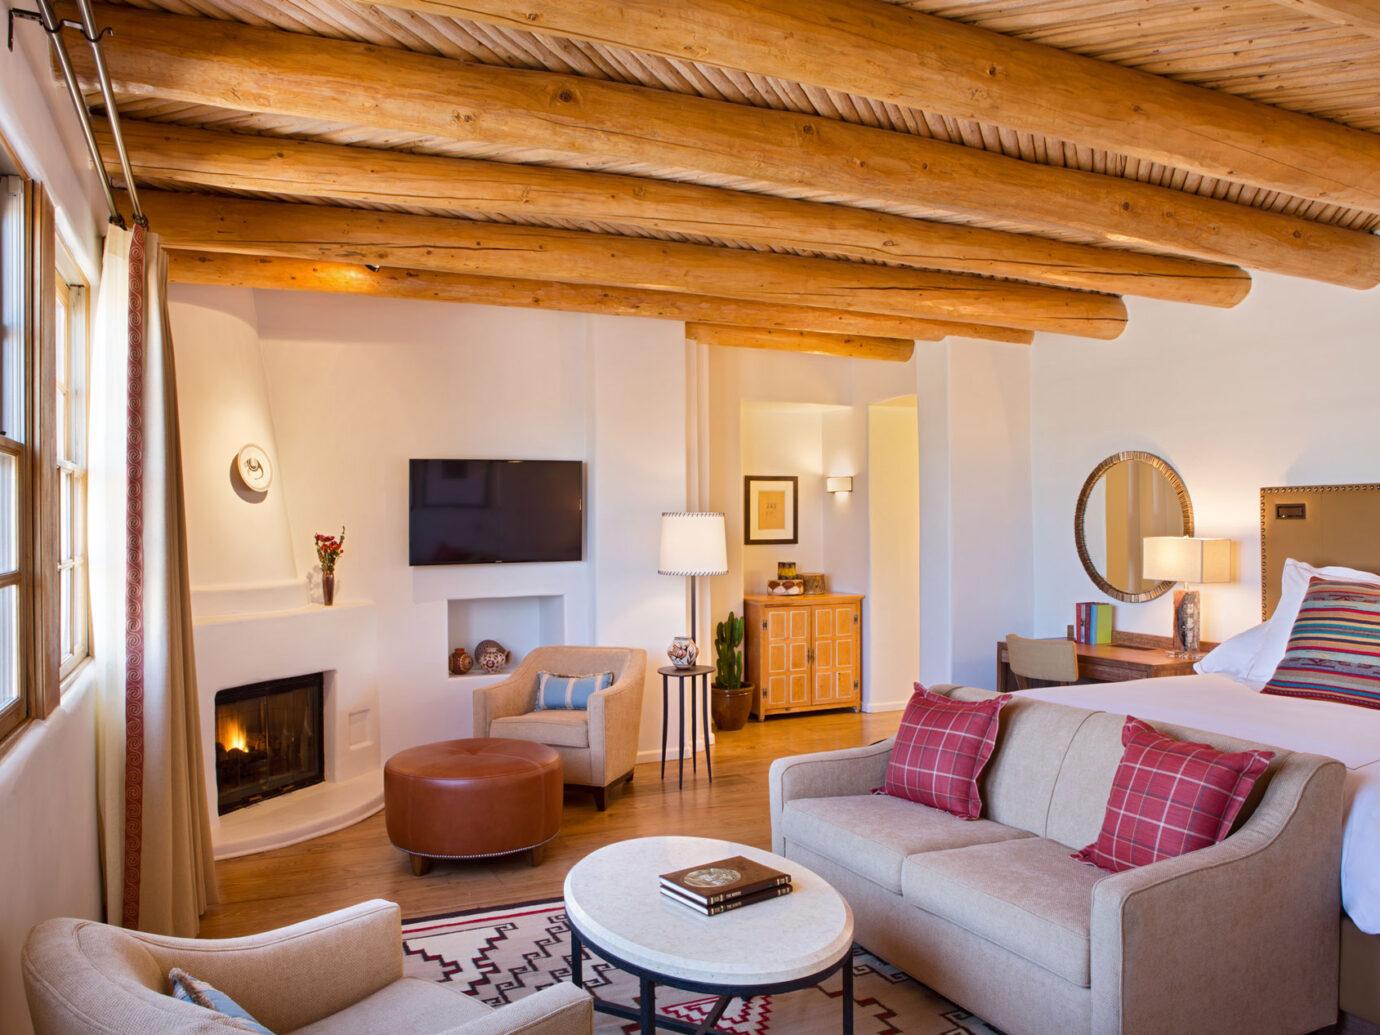 Living room at the Rosewood Inn Anasazi